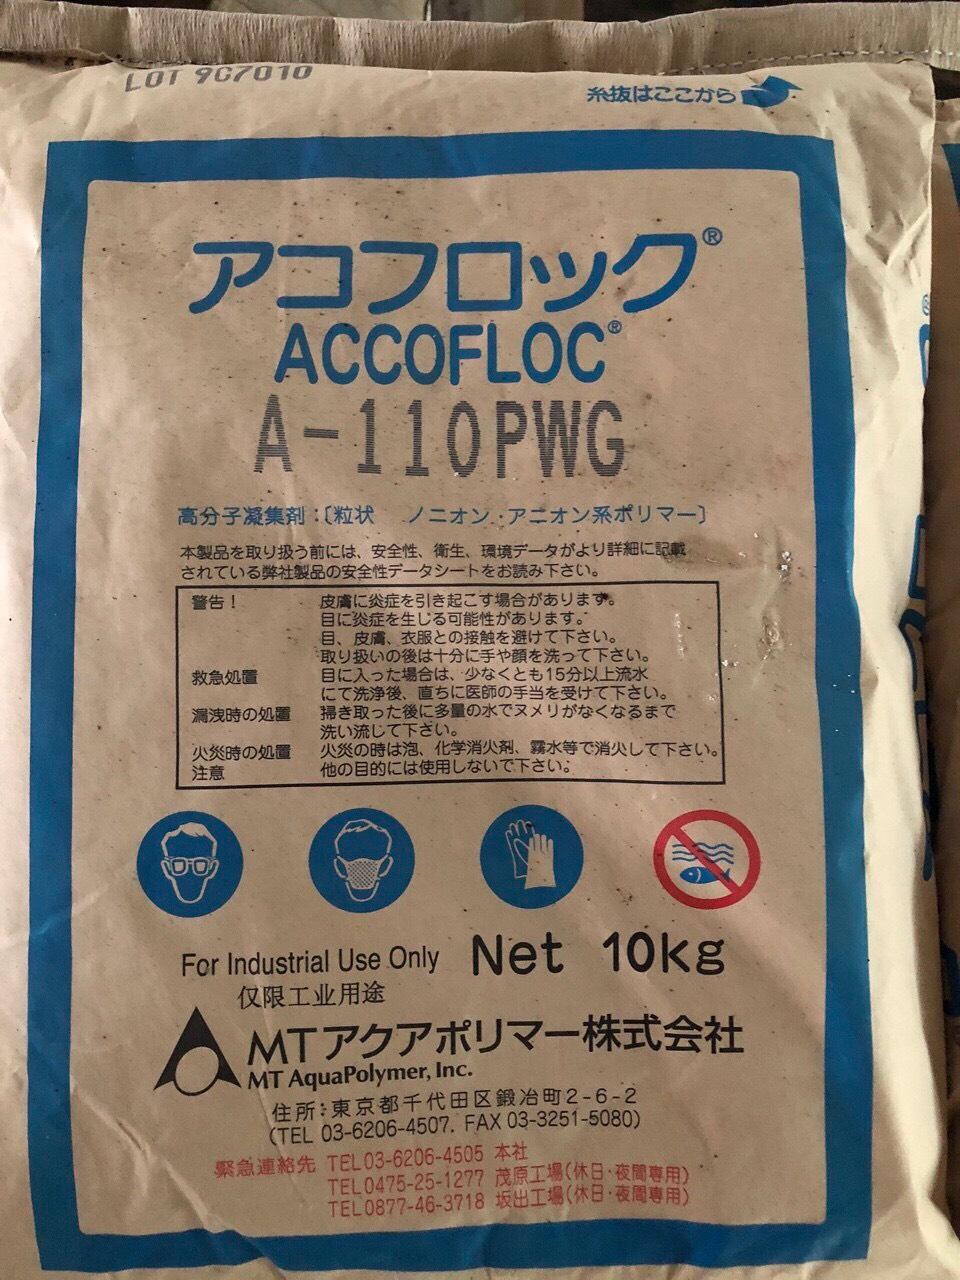 Polymer Ancofloc - A110 PWG